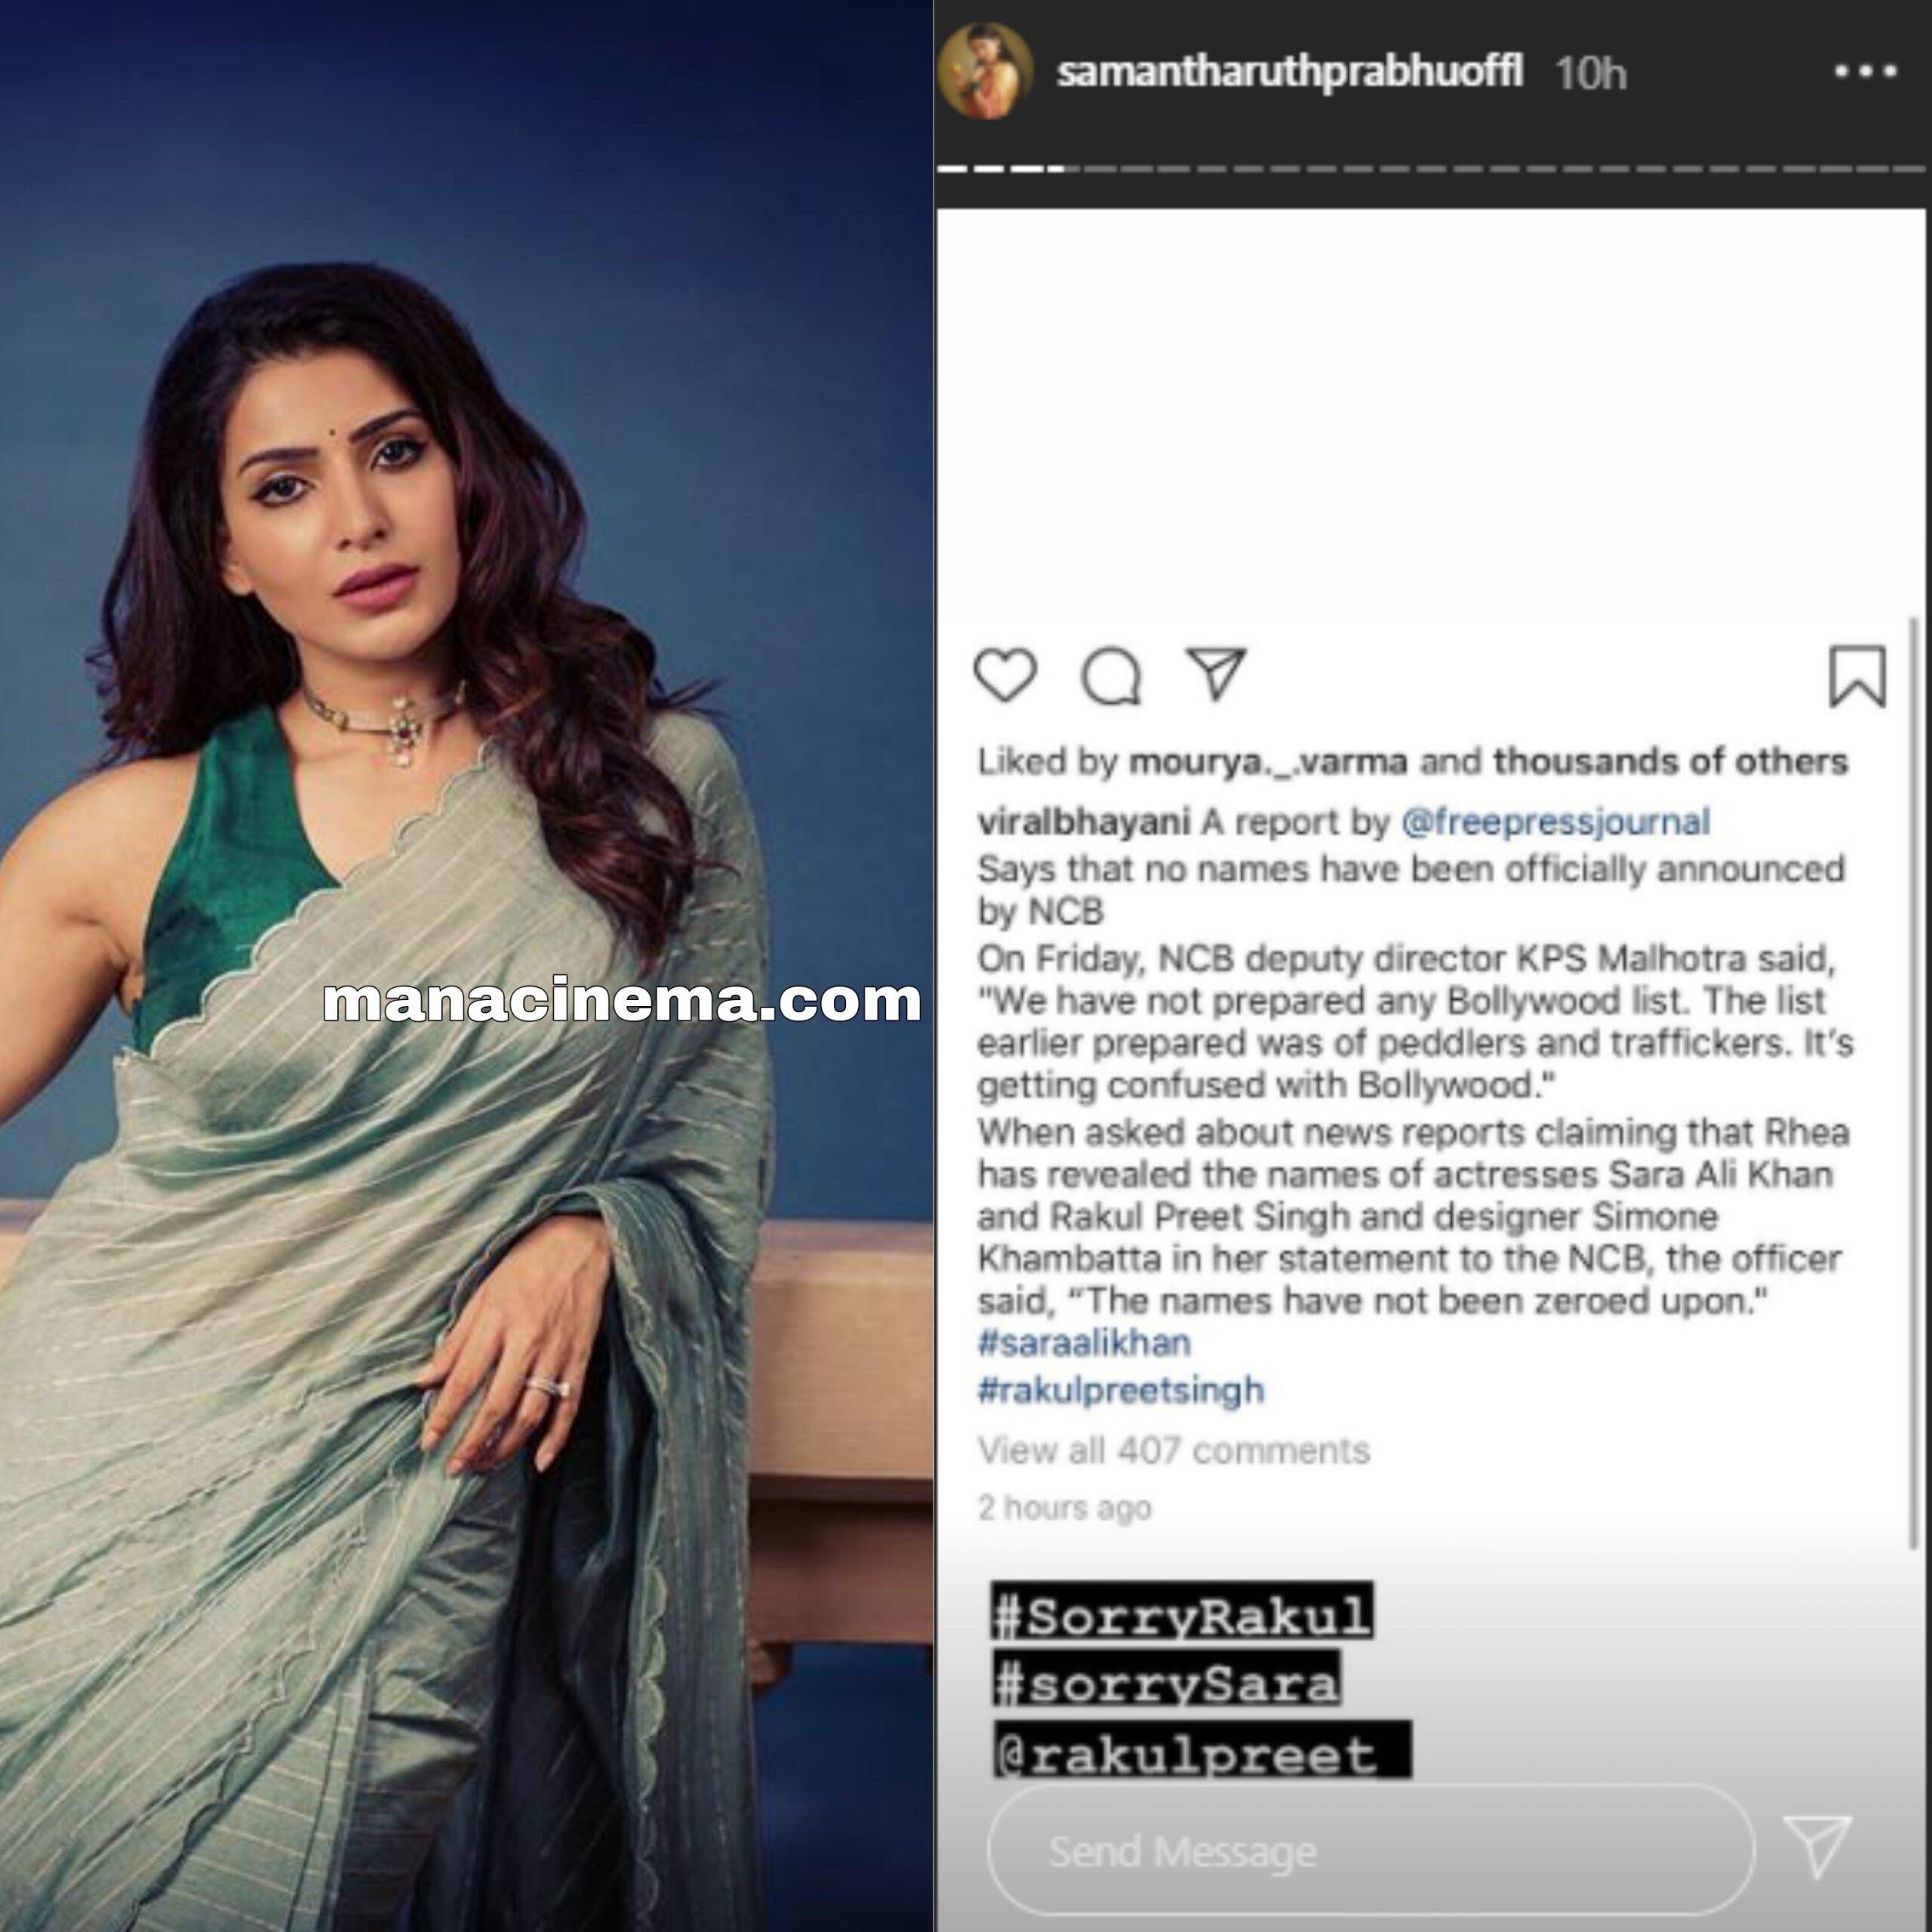 Samantha writes #SorryRakul and #SorrySara